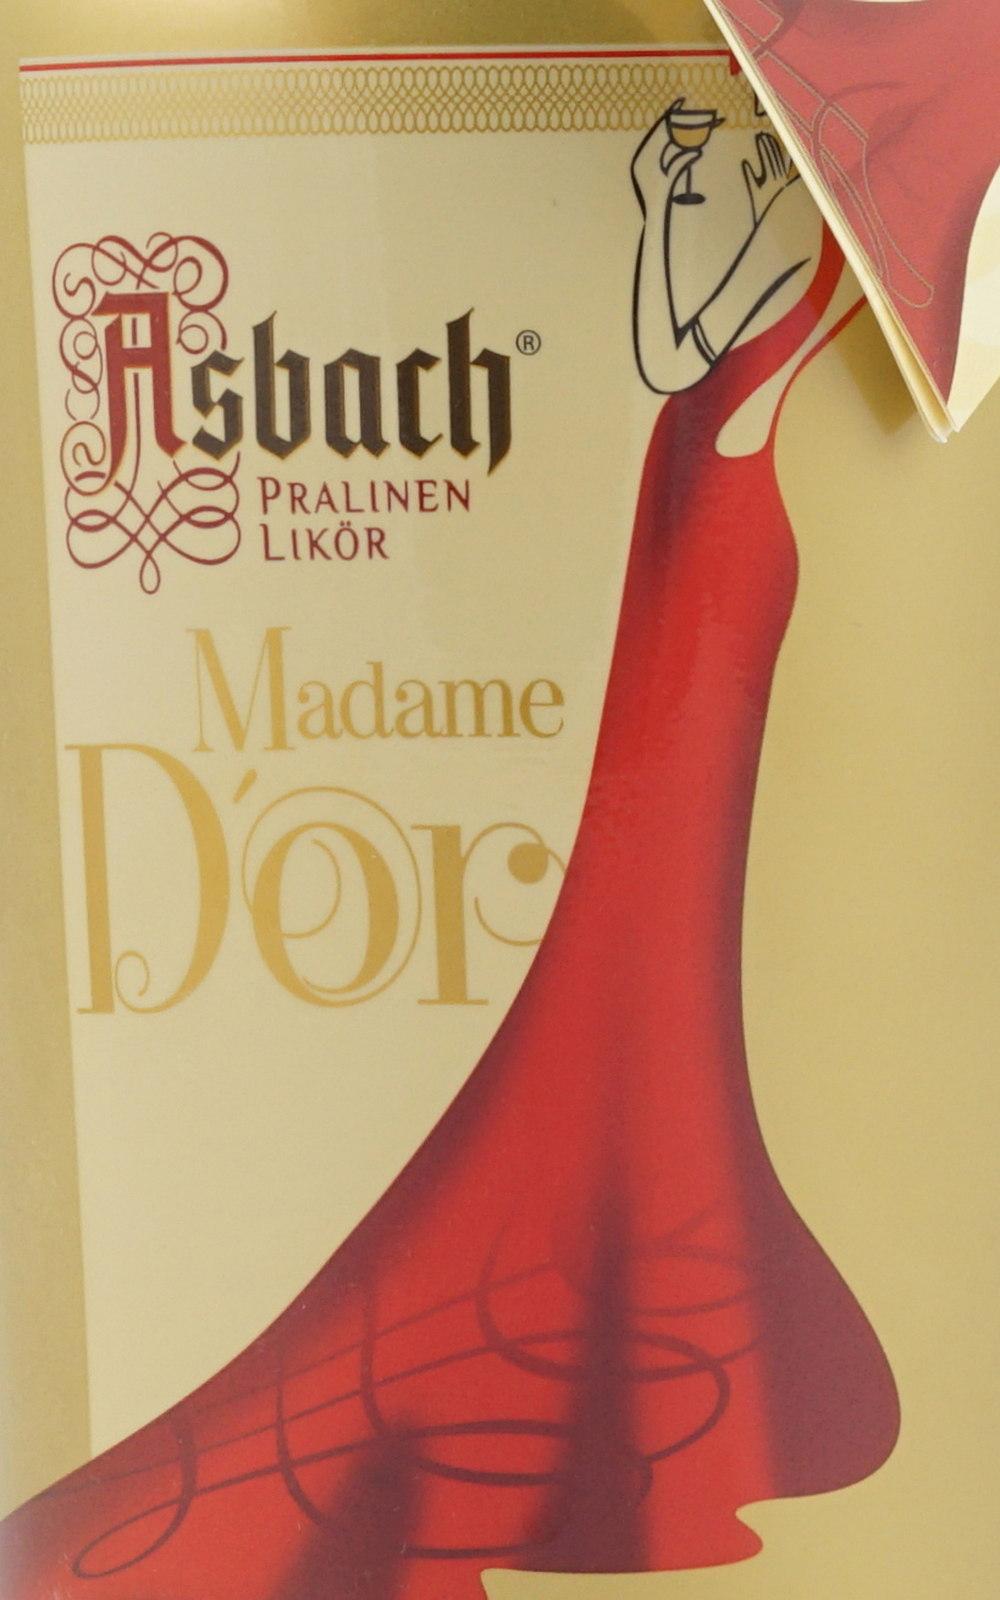 Asbach Madame Dor Pralinenlikör 0,7 Liter 15 % Vol